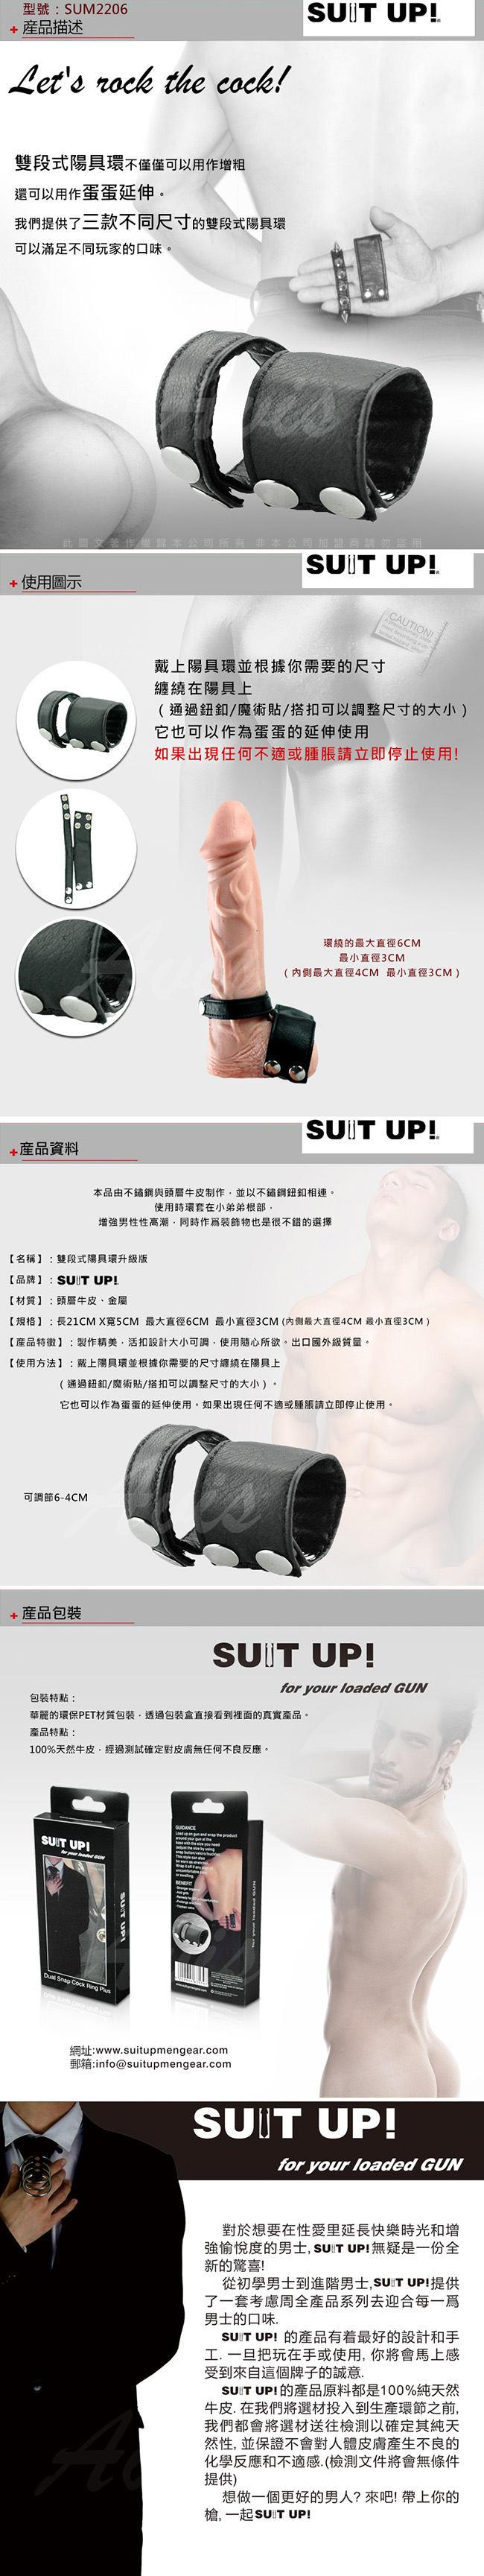 SUIT UP! SM情趣 雙段式陽具環 升級版